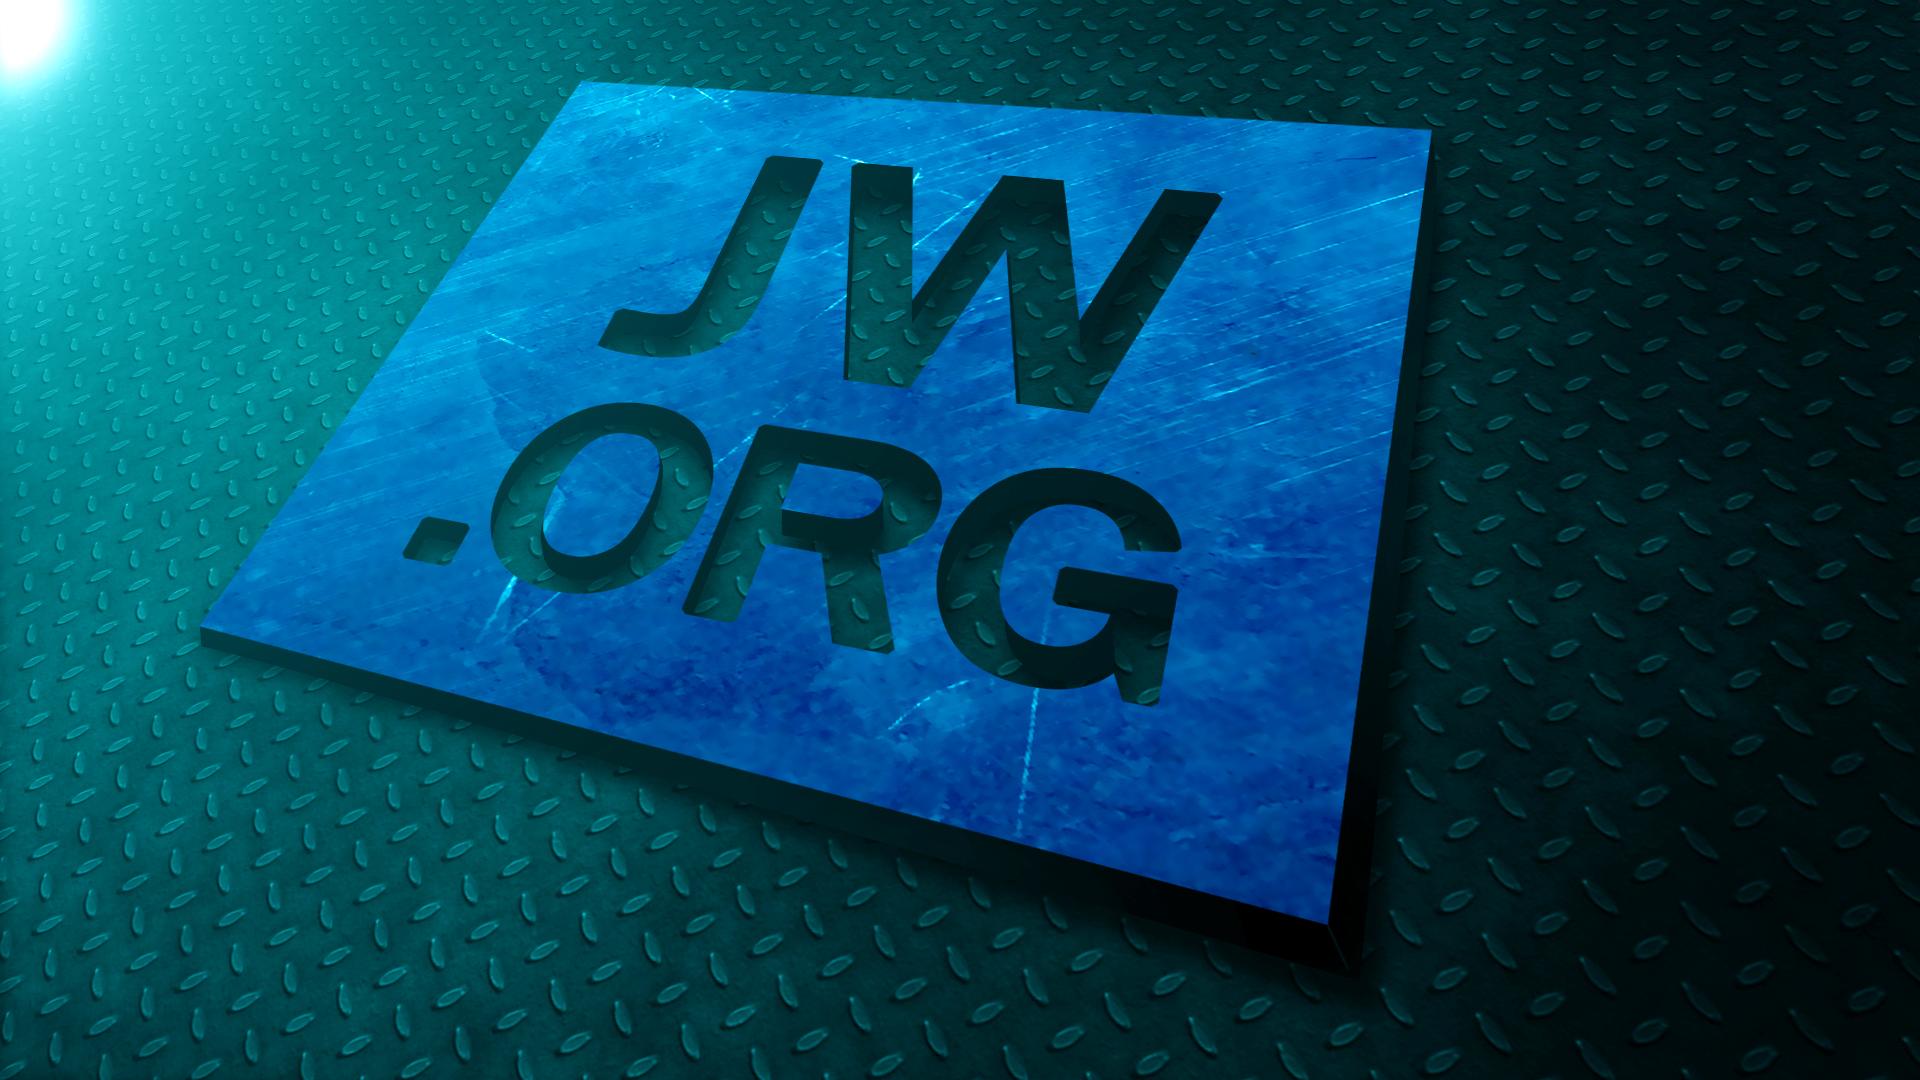 JWORG Wallpaper by svsj29 1920x1080